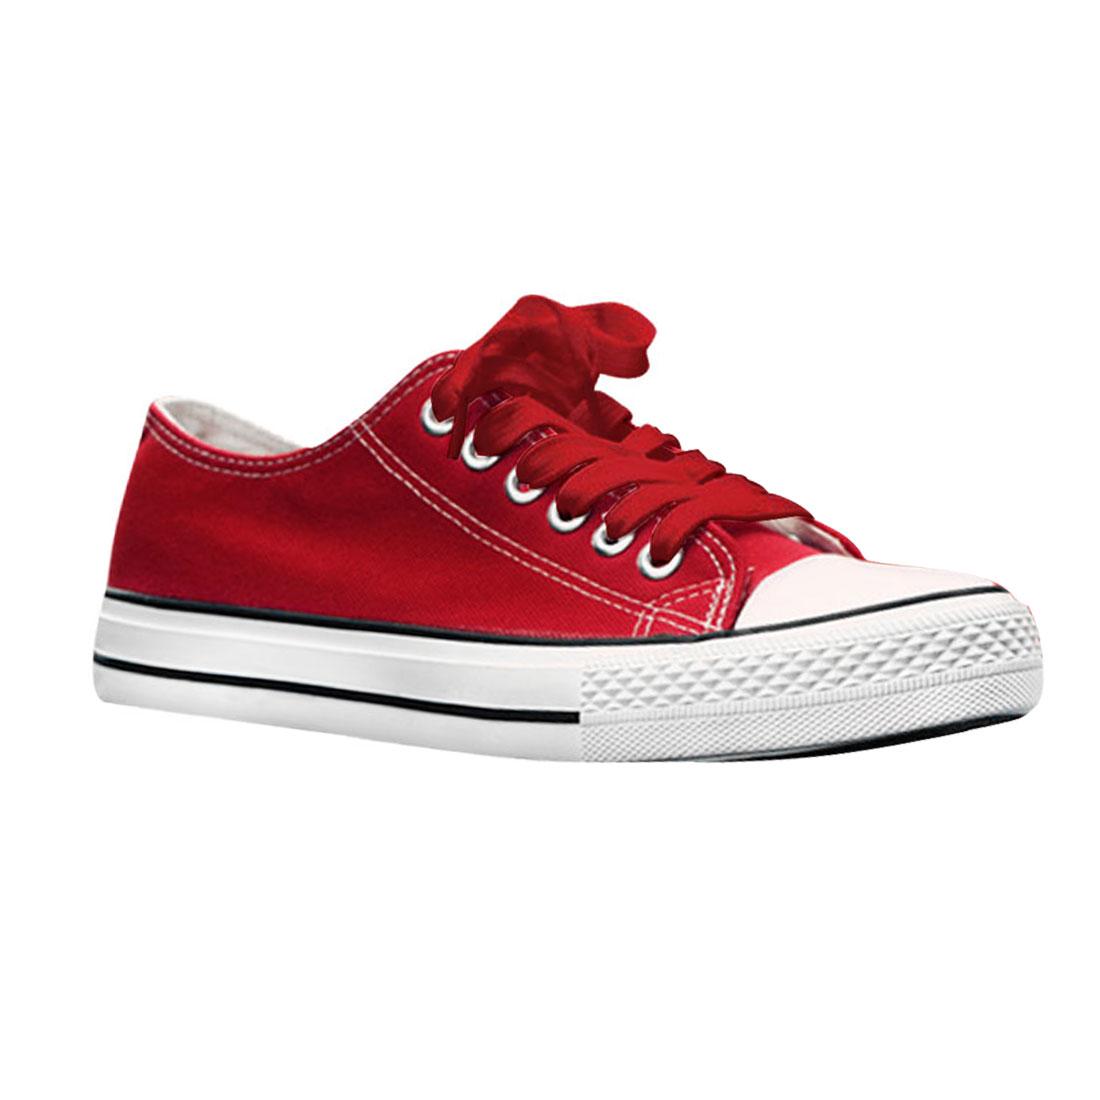 Unisex Red White Capped Toe Canvas Upper Sneaker Shoe Us Size Men 7/Women 9